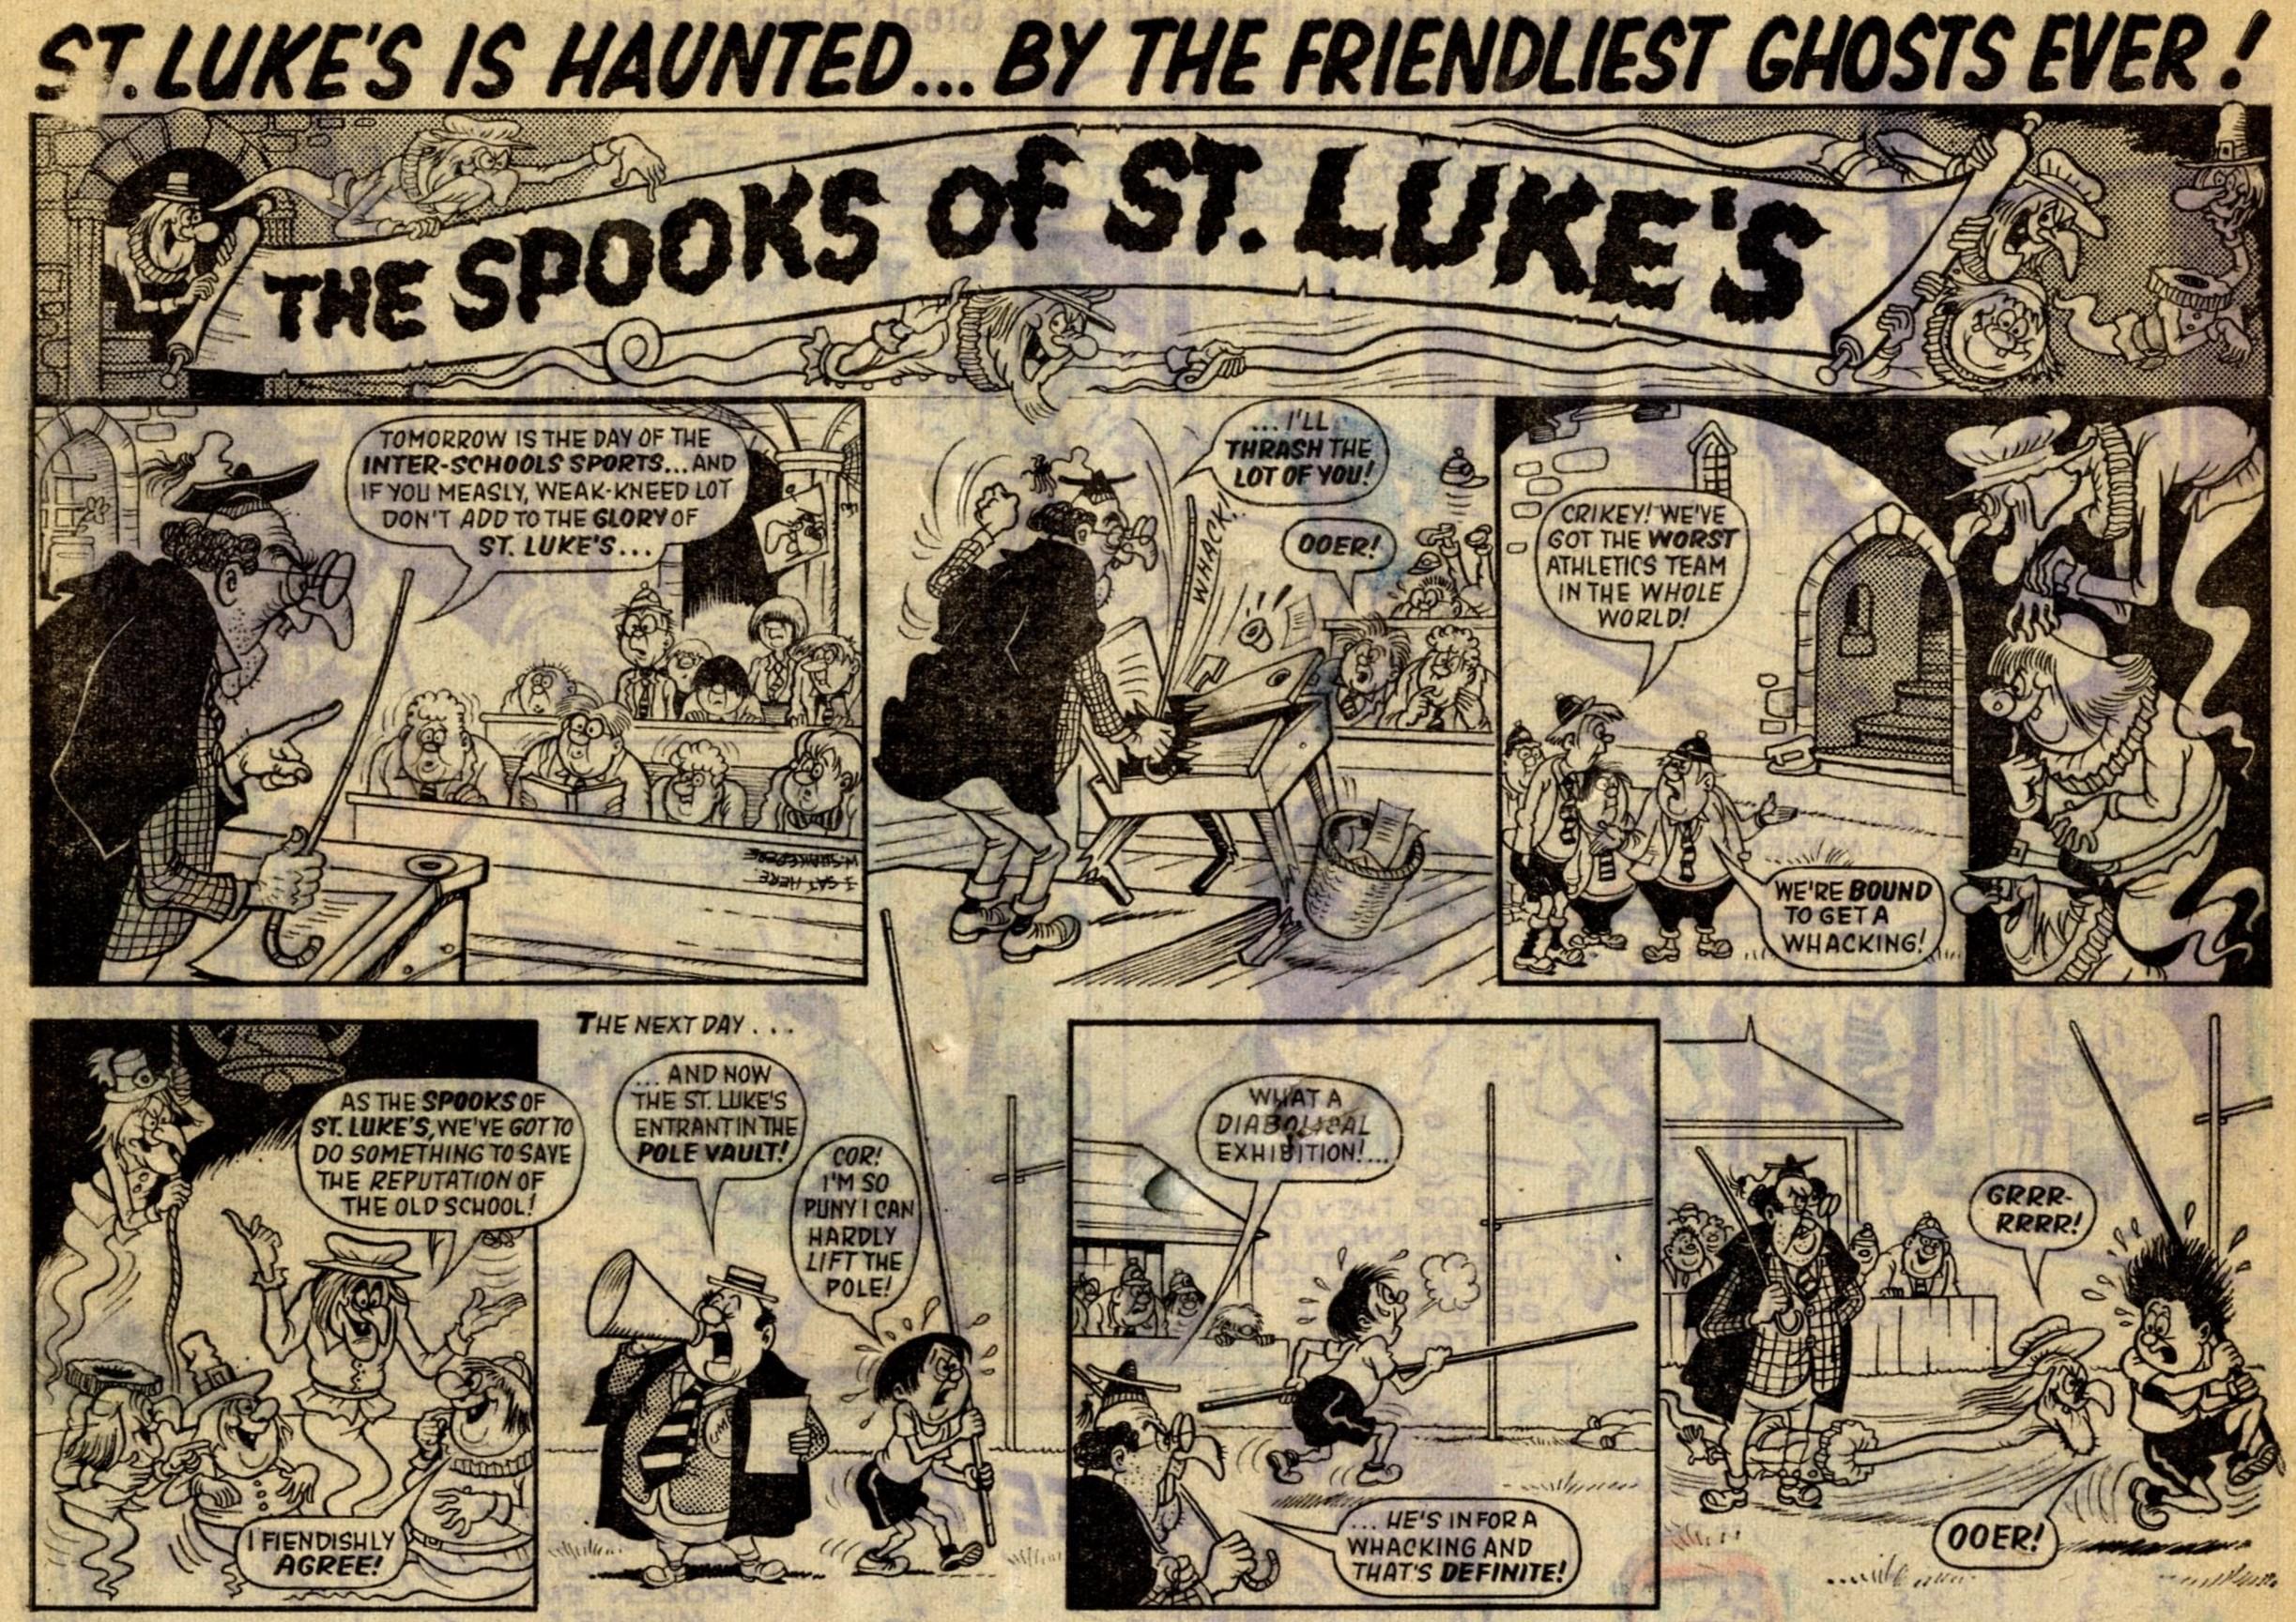 The Spooks of St Luke's: Cyril Price (artist)